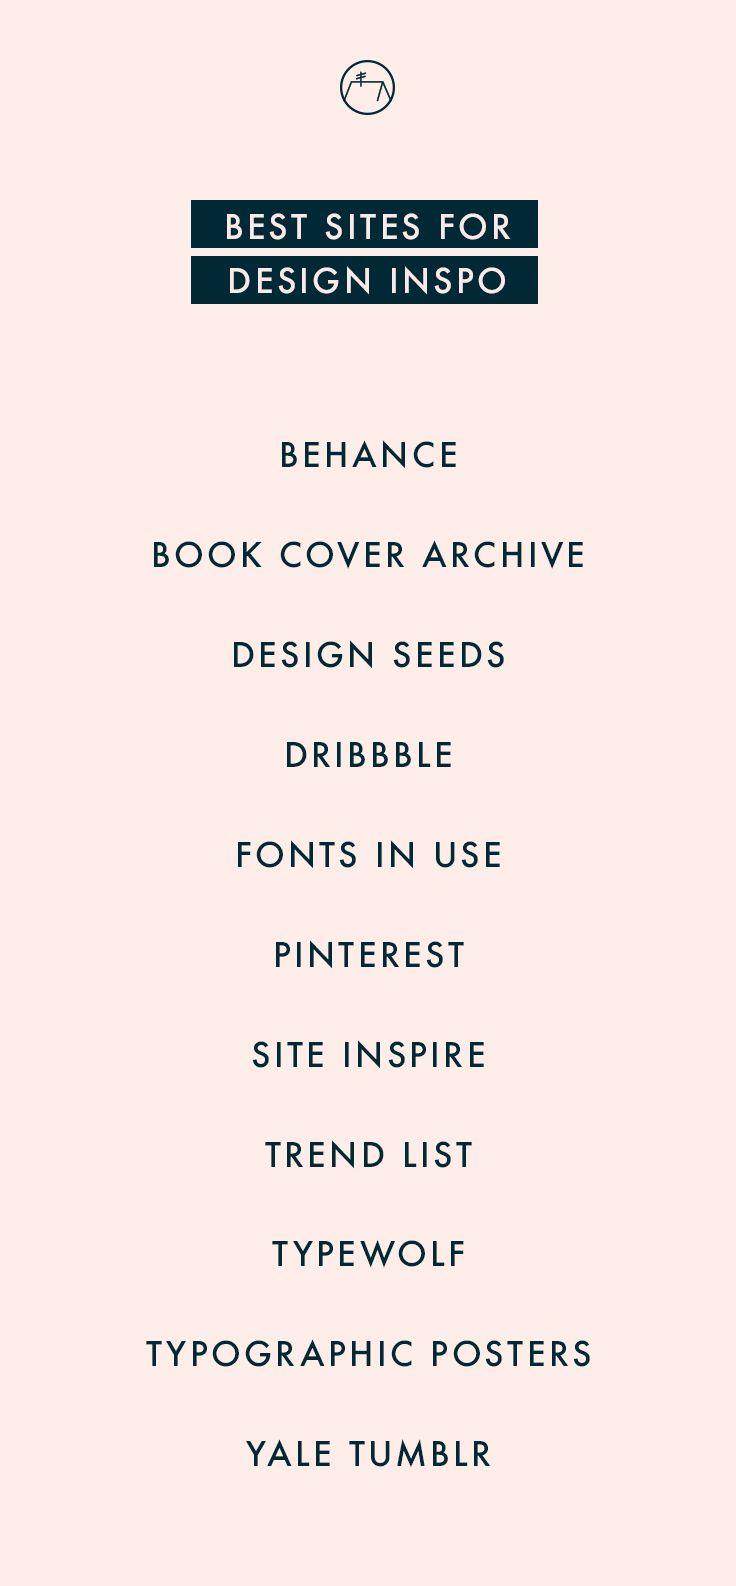 Design Inspo. My go-to places for  design inspiration.